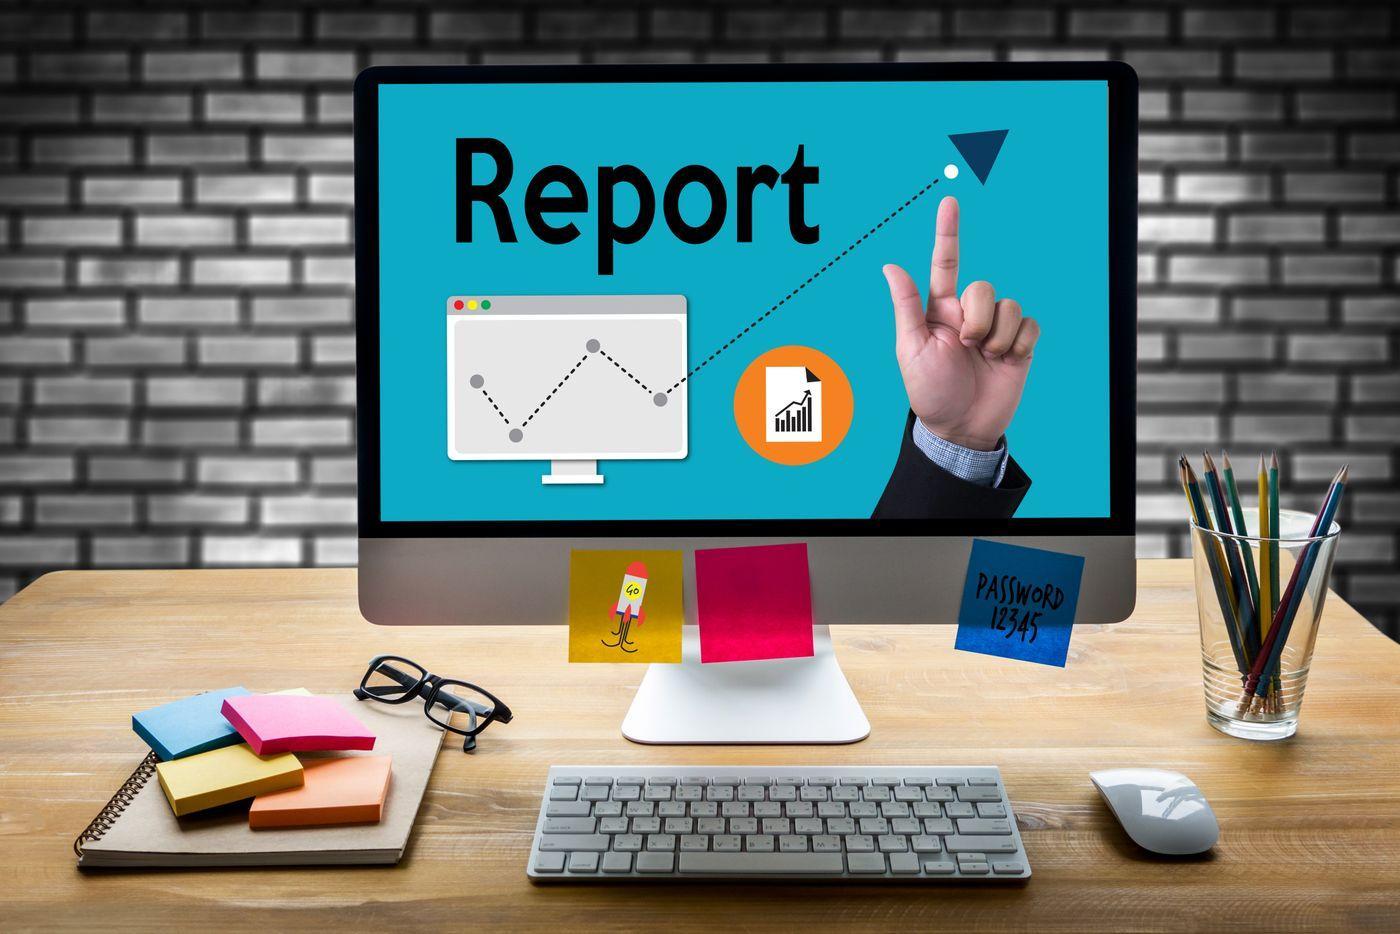 Track Progress Through Consistent Reports